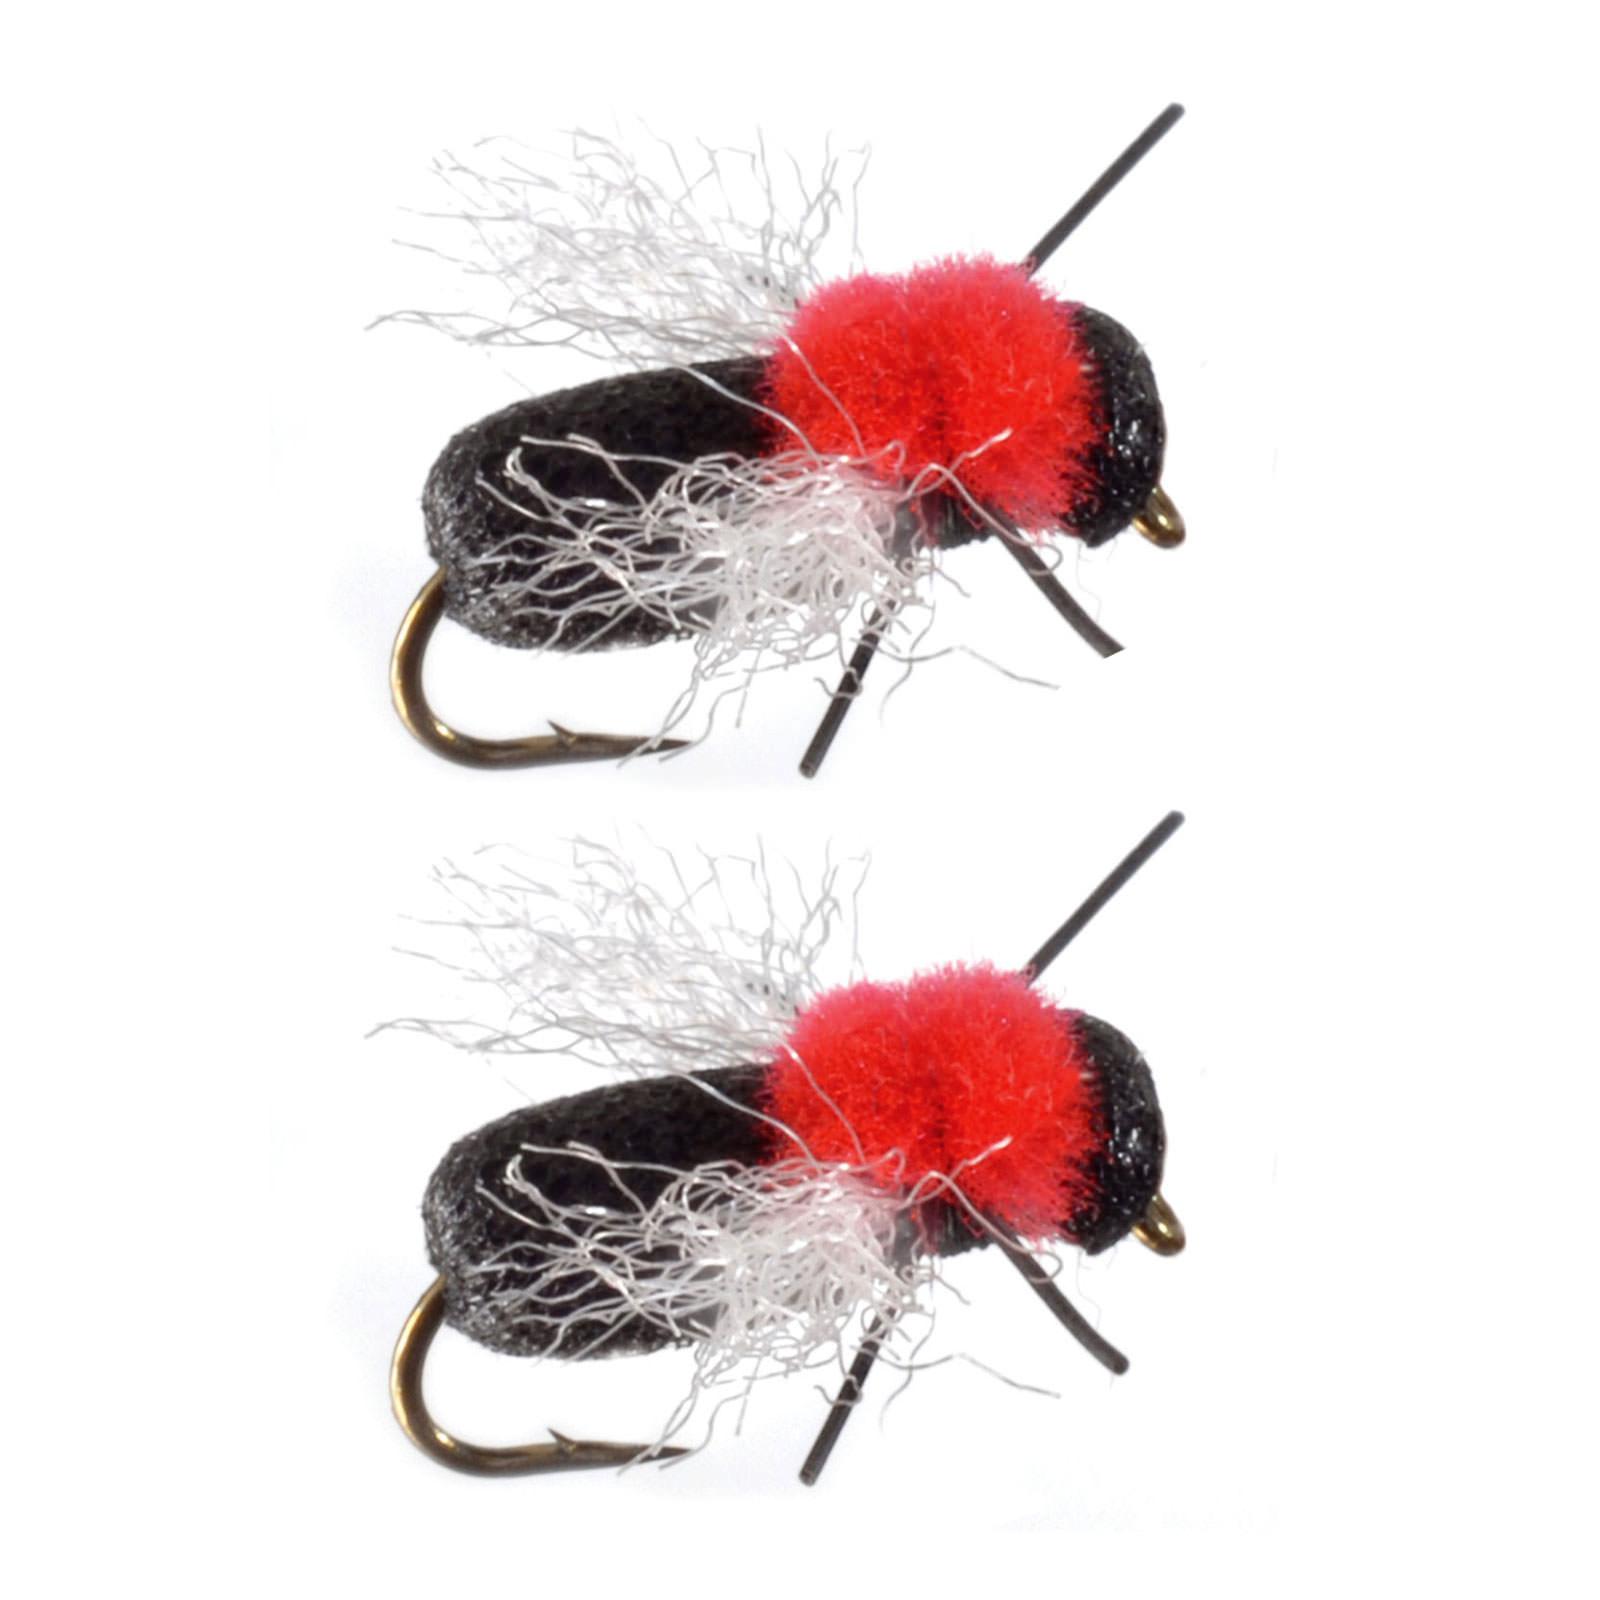 Umpqua Foam Flying Ant Black Terrestrials 2 Pack Dry Fly Fishing Flies